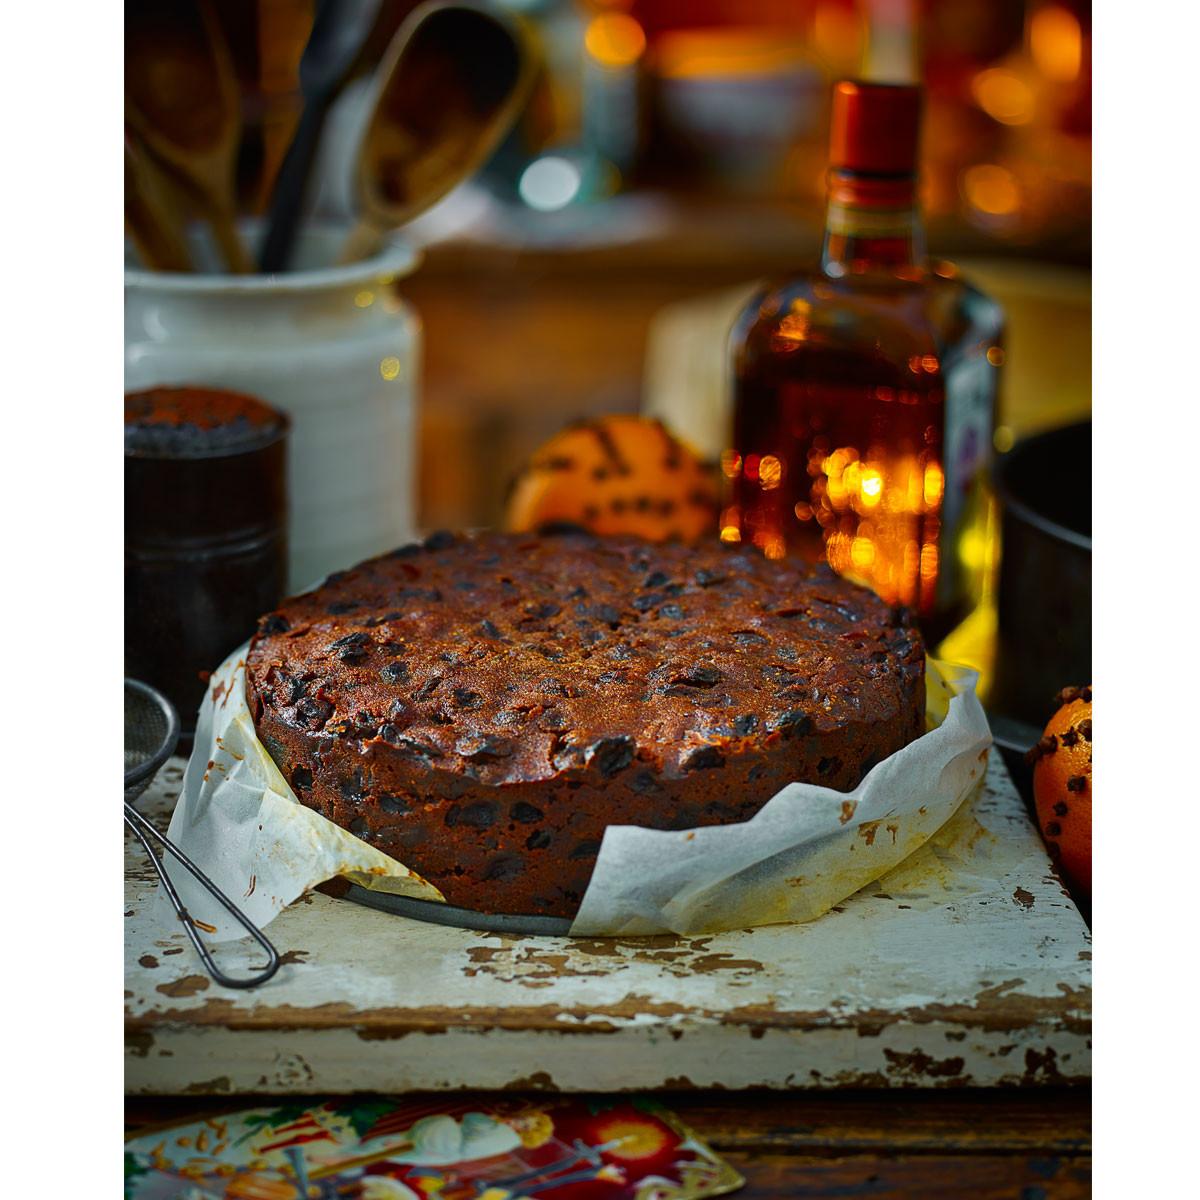 Best Christmas Cake Recipe  Christmas cake recipe Best Christmas cake recipes Good